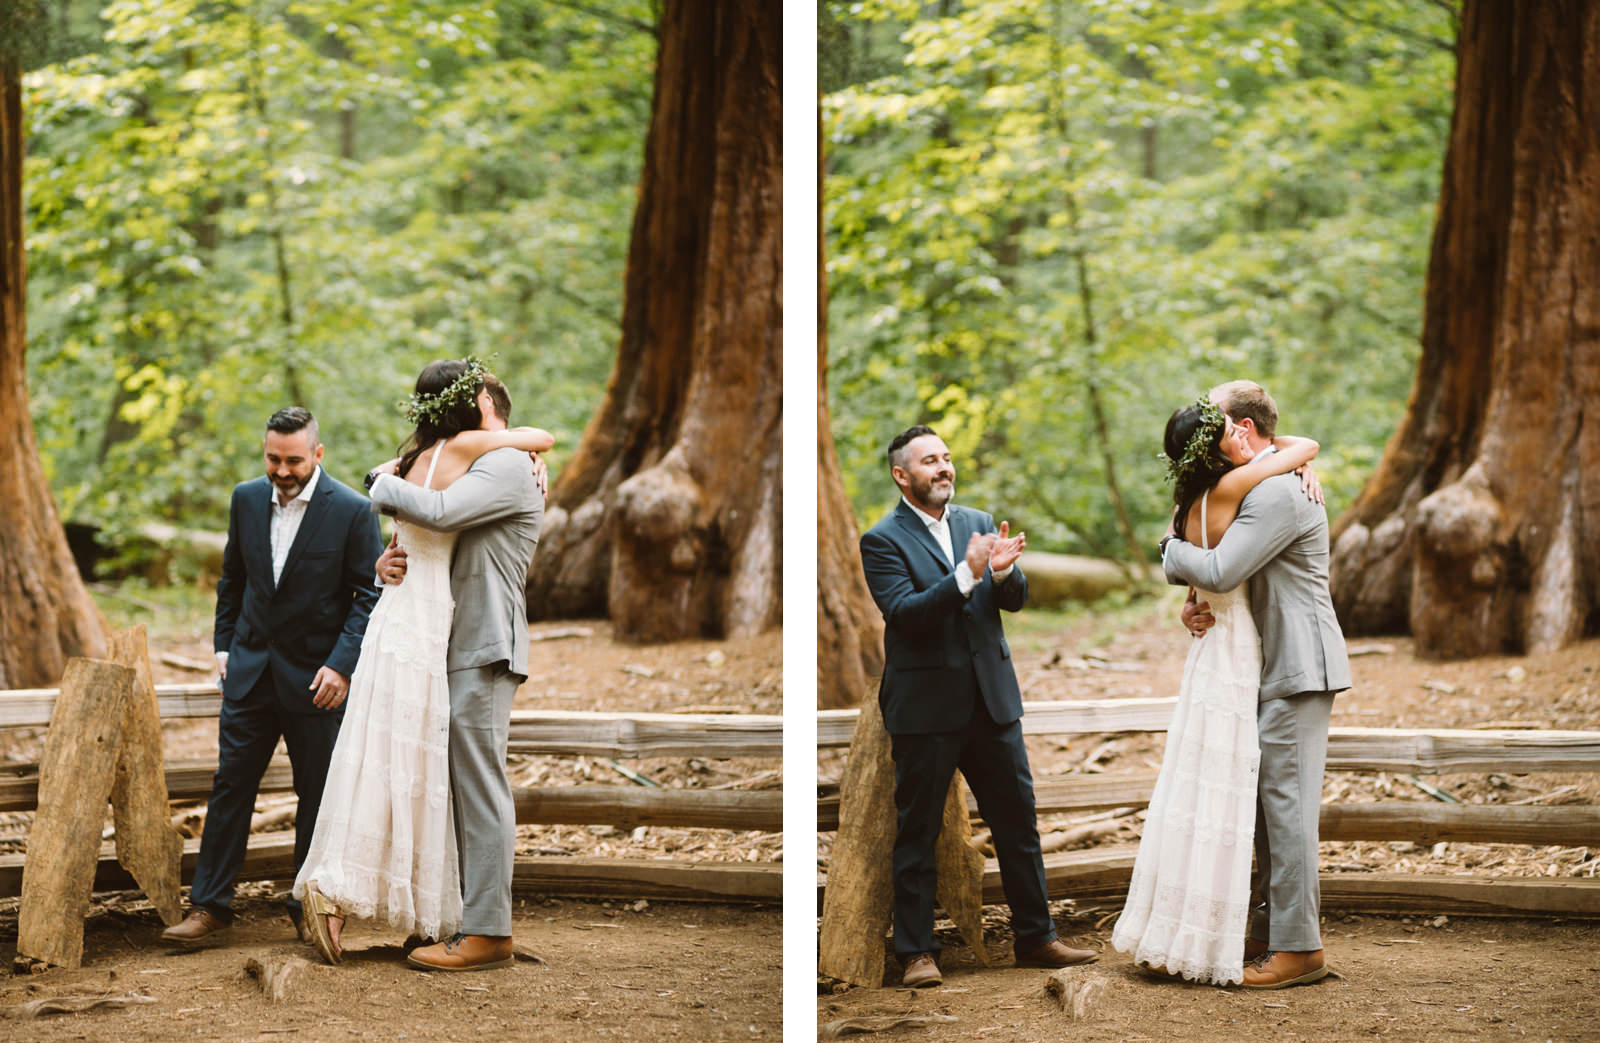 yosemite-intimate-wedding-064 YOSEMITE INTIMATE WEDDING